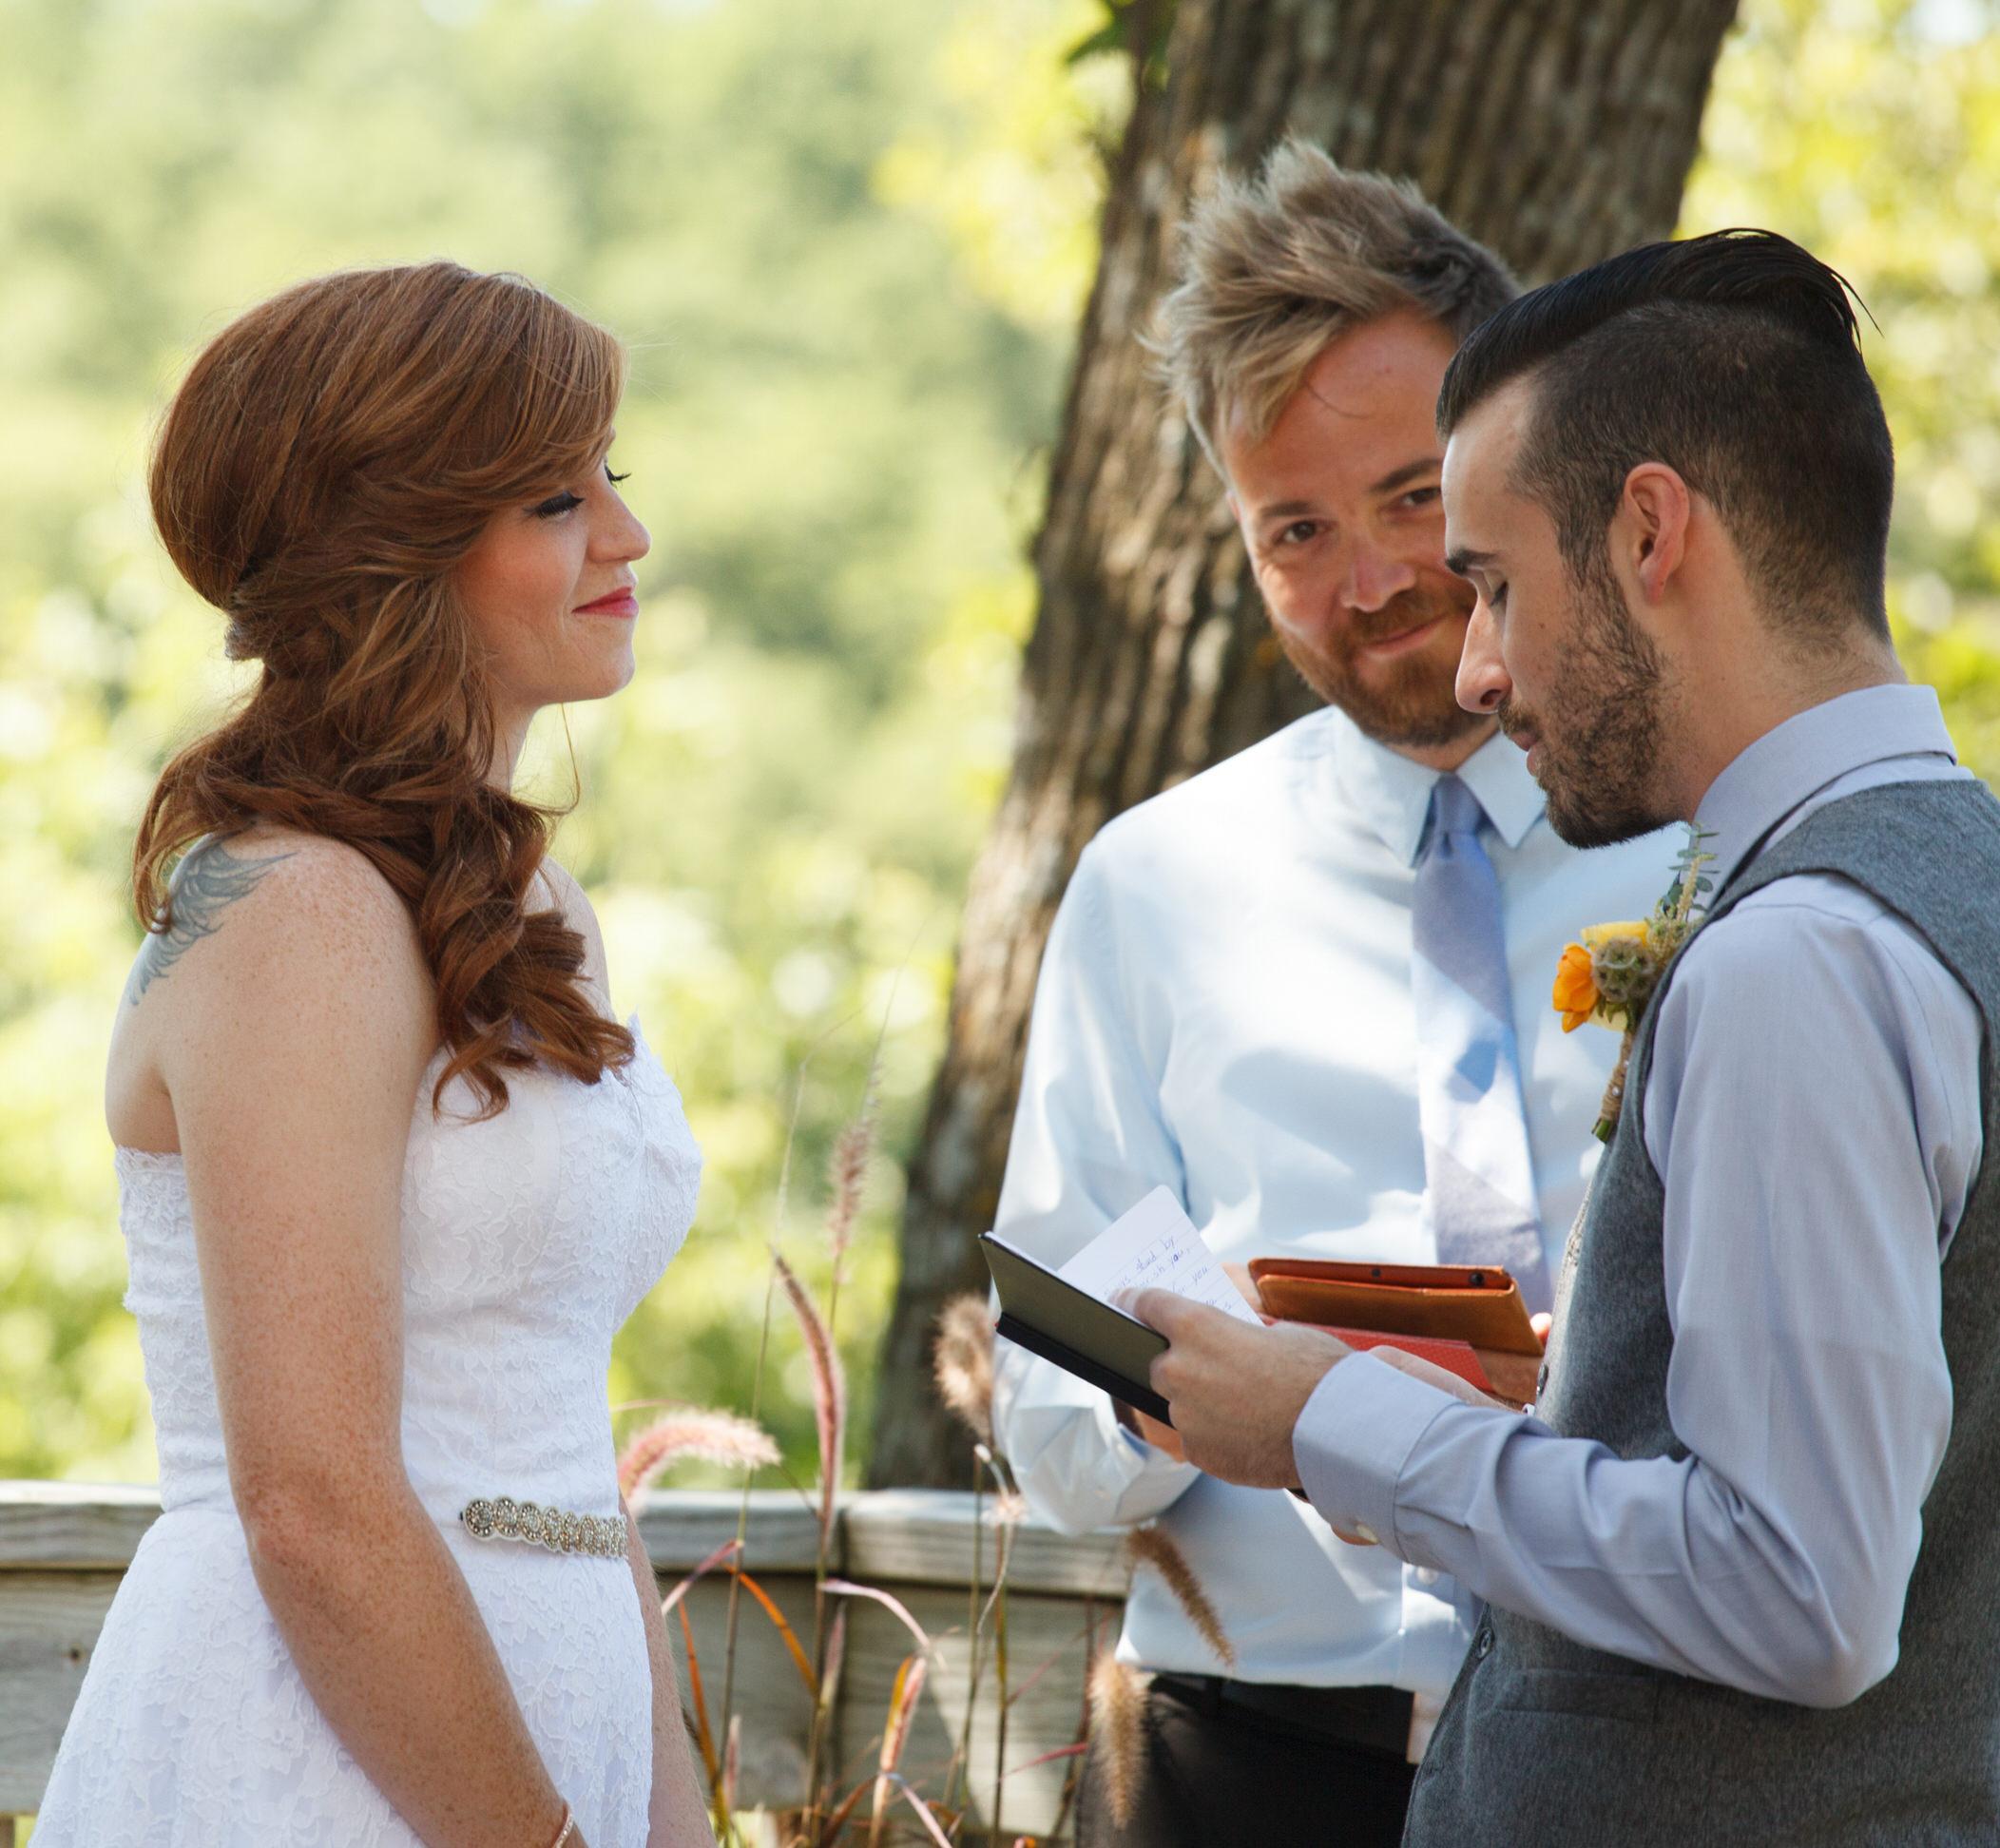 7-25-2015 Sarah and Jimmy's Eagle Ridge Downtown Galena Wedding-146.jpg